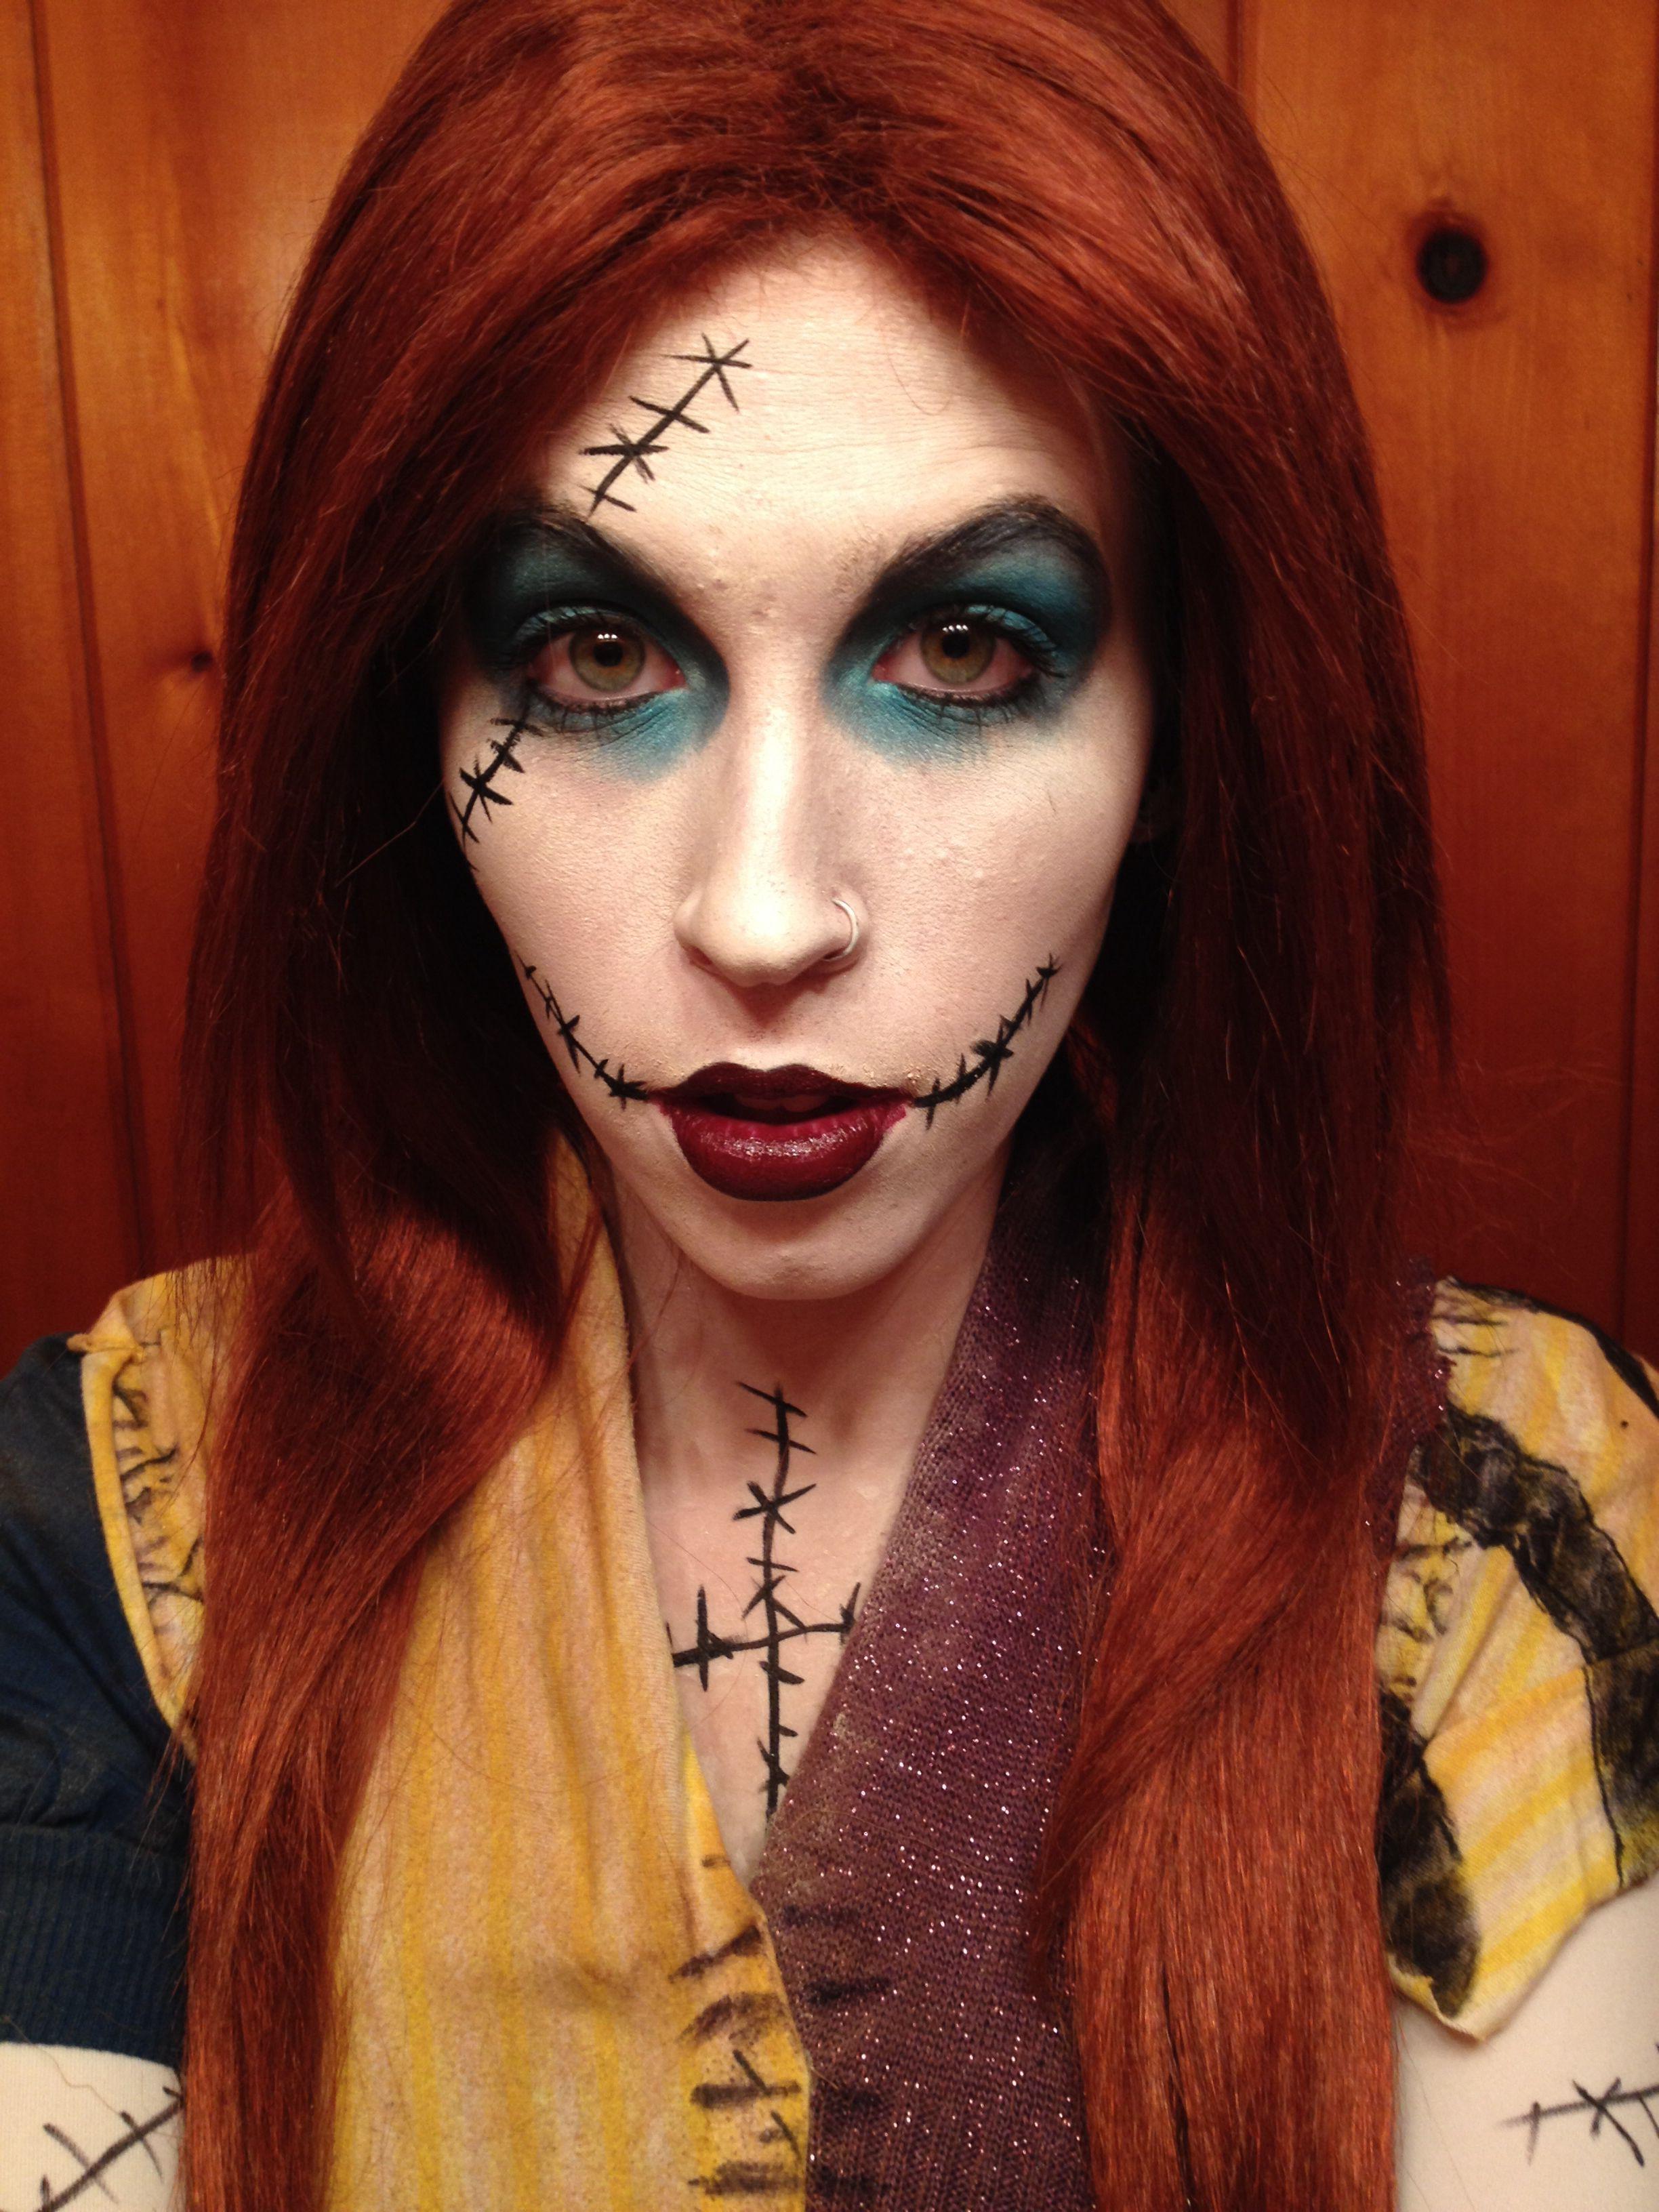 Sally Nightmare Before Christmas makeup Halloween makeup